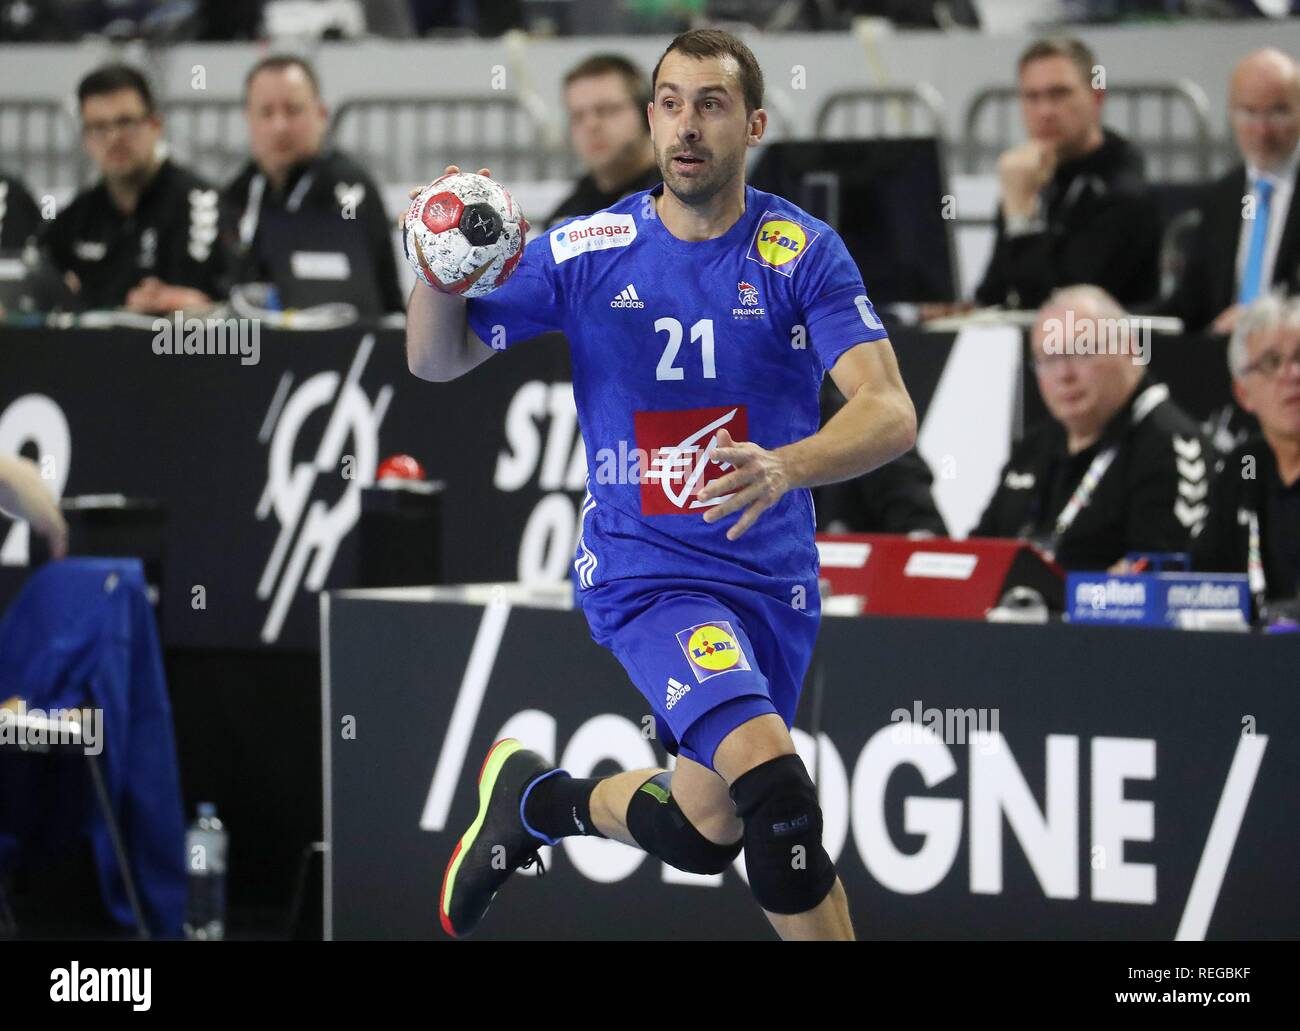 firo: 19.01.2019, Handball: World Cup World Cup Main Round France - Spain Single Action, Michael GUIGOU, FRA   usage worldwide - Stock Image